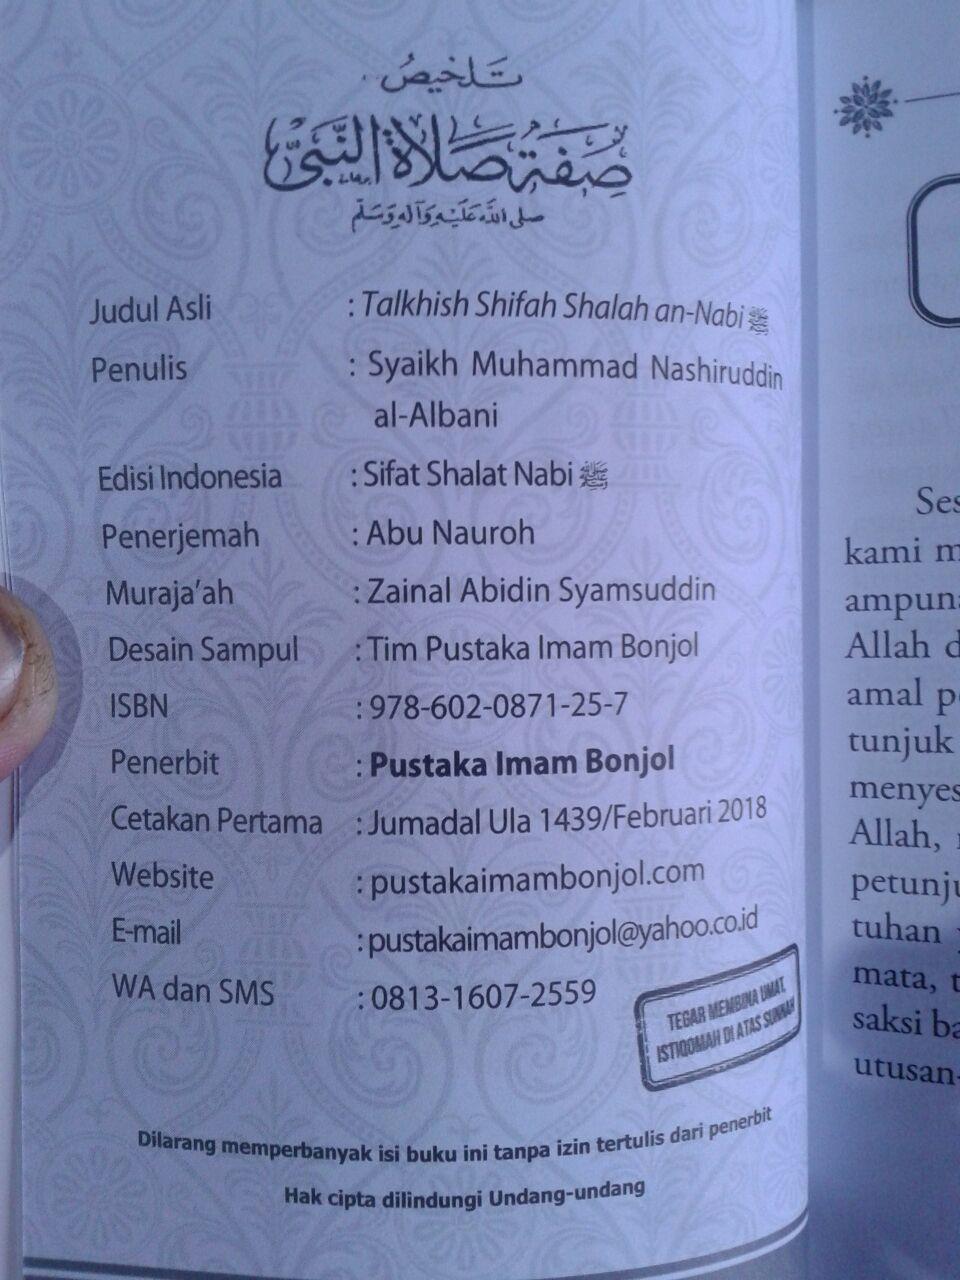 Buku Ringkasan Sifat Shalat Nabi Syaikh Al-Albani isi 3